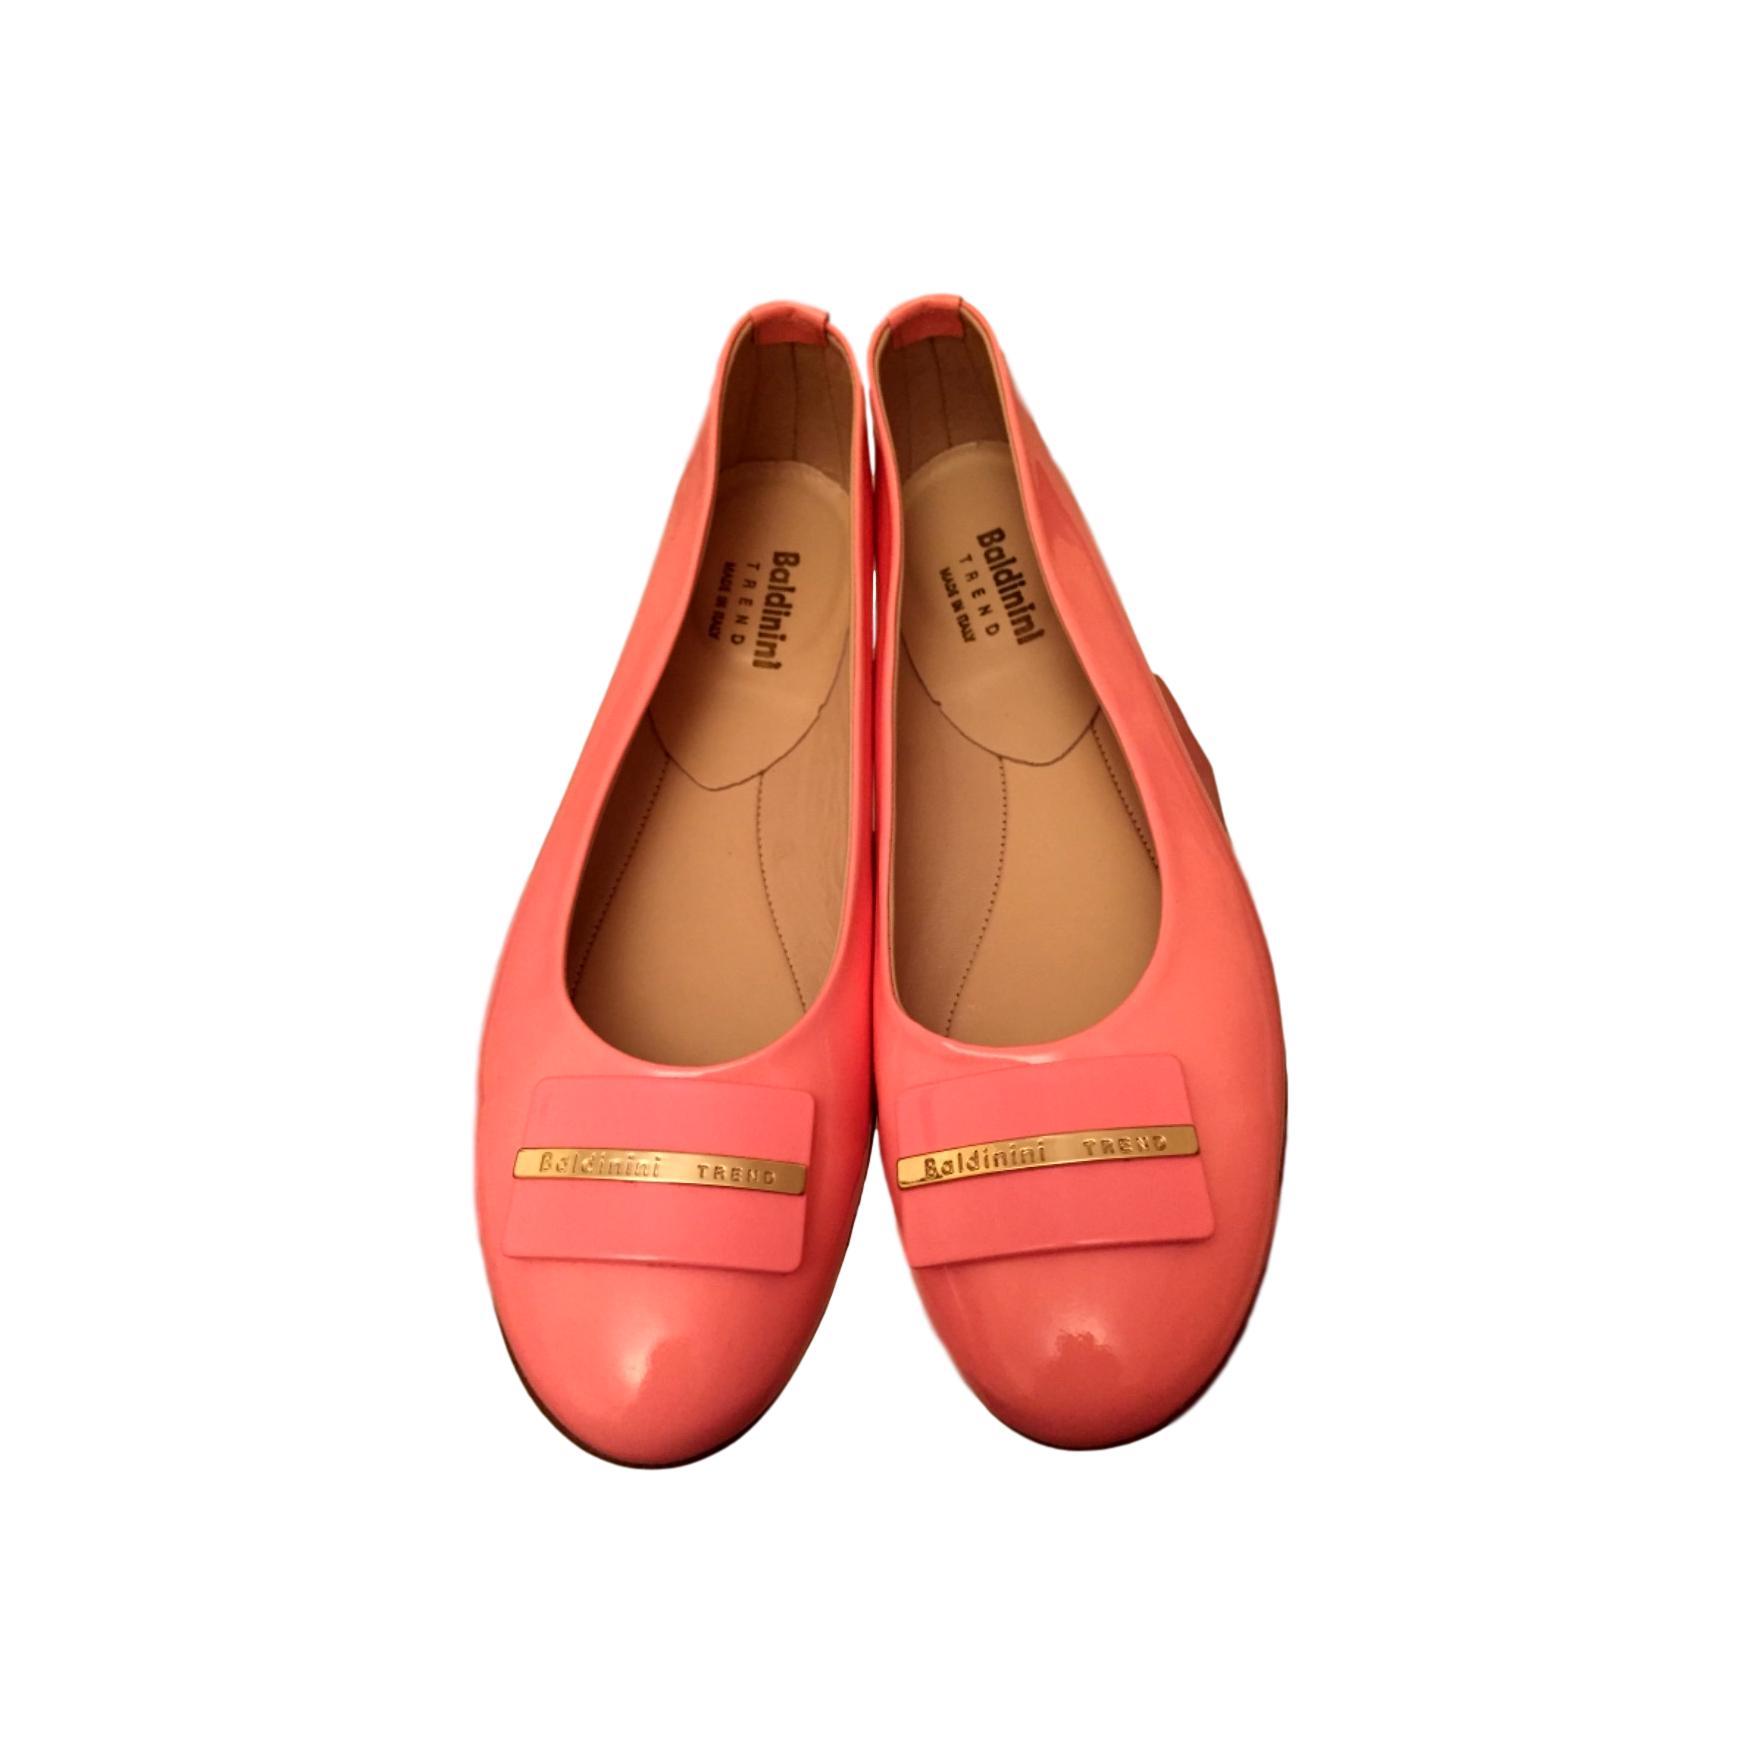 0d50a224b Купить балетки Baldinini за 12500 руб. в интернет магазине - бутике ...